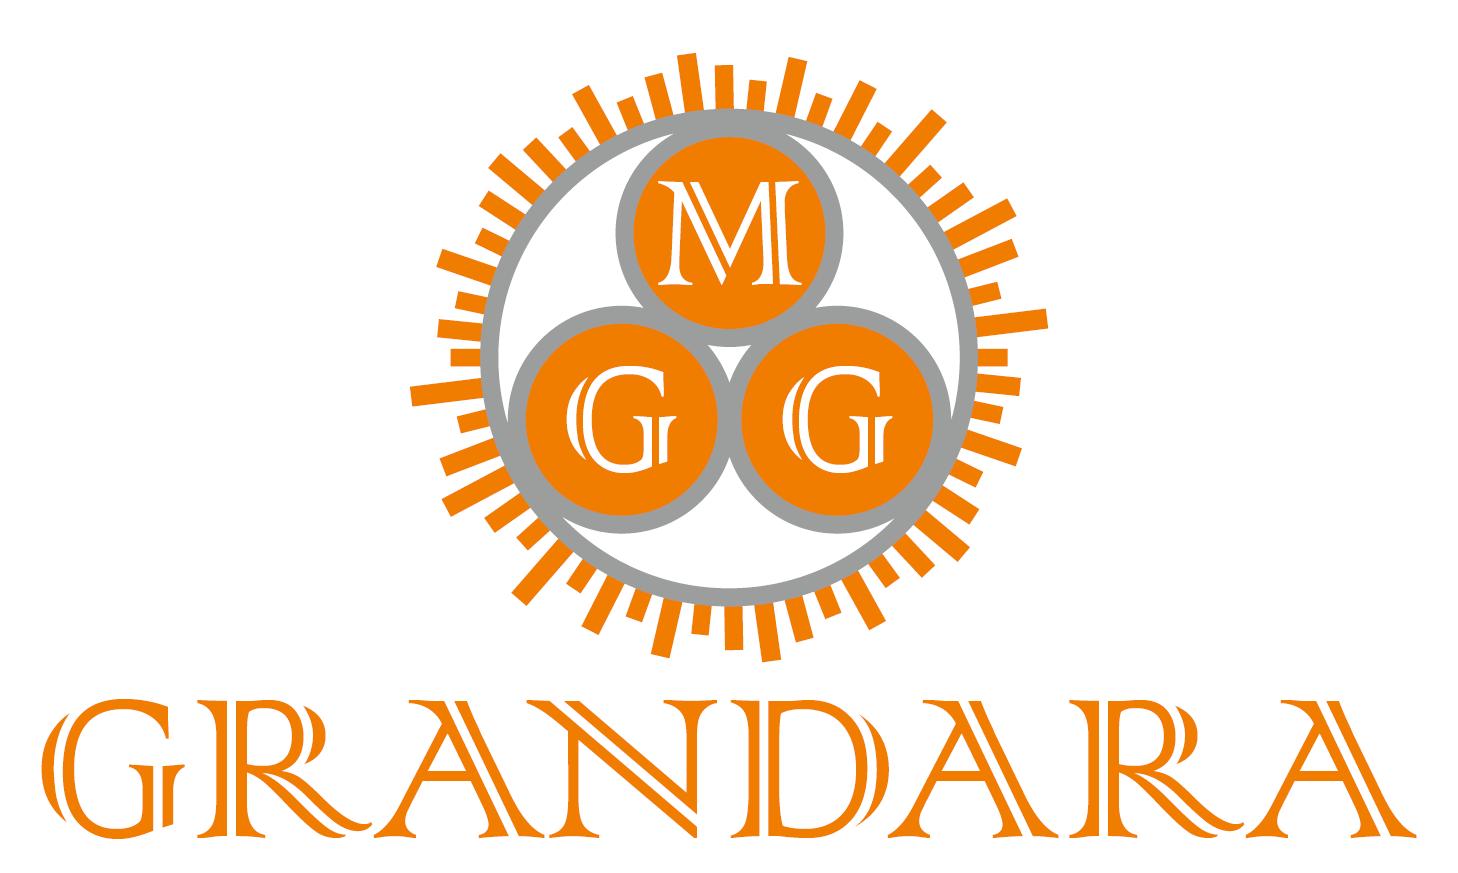 Grandara logo didelis